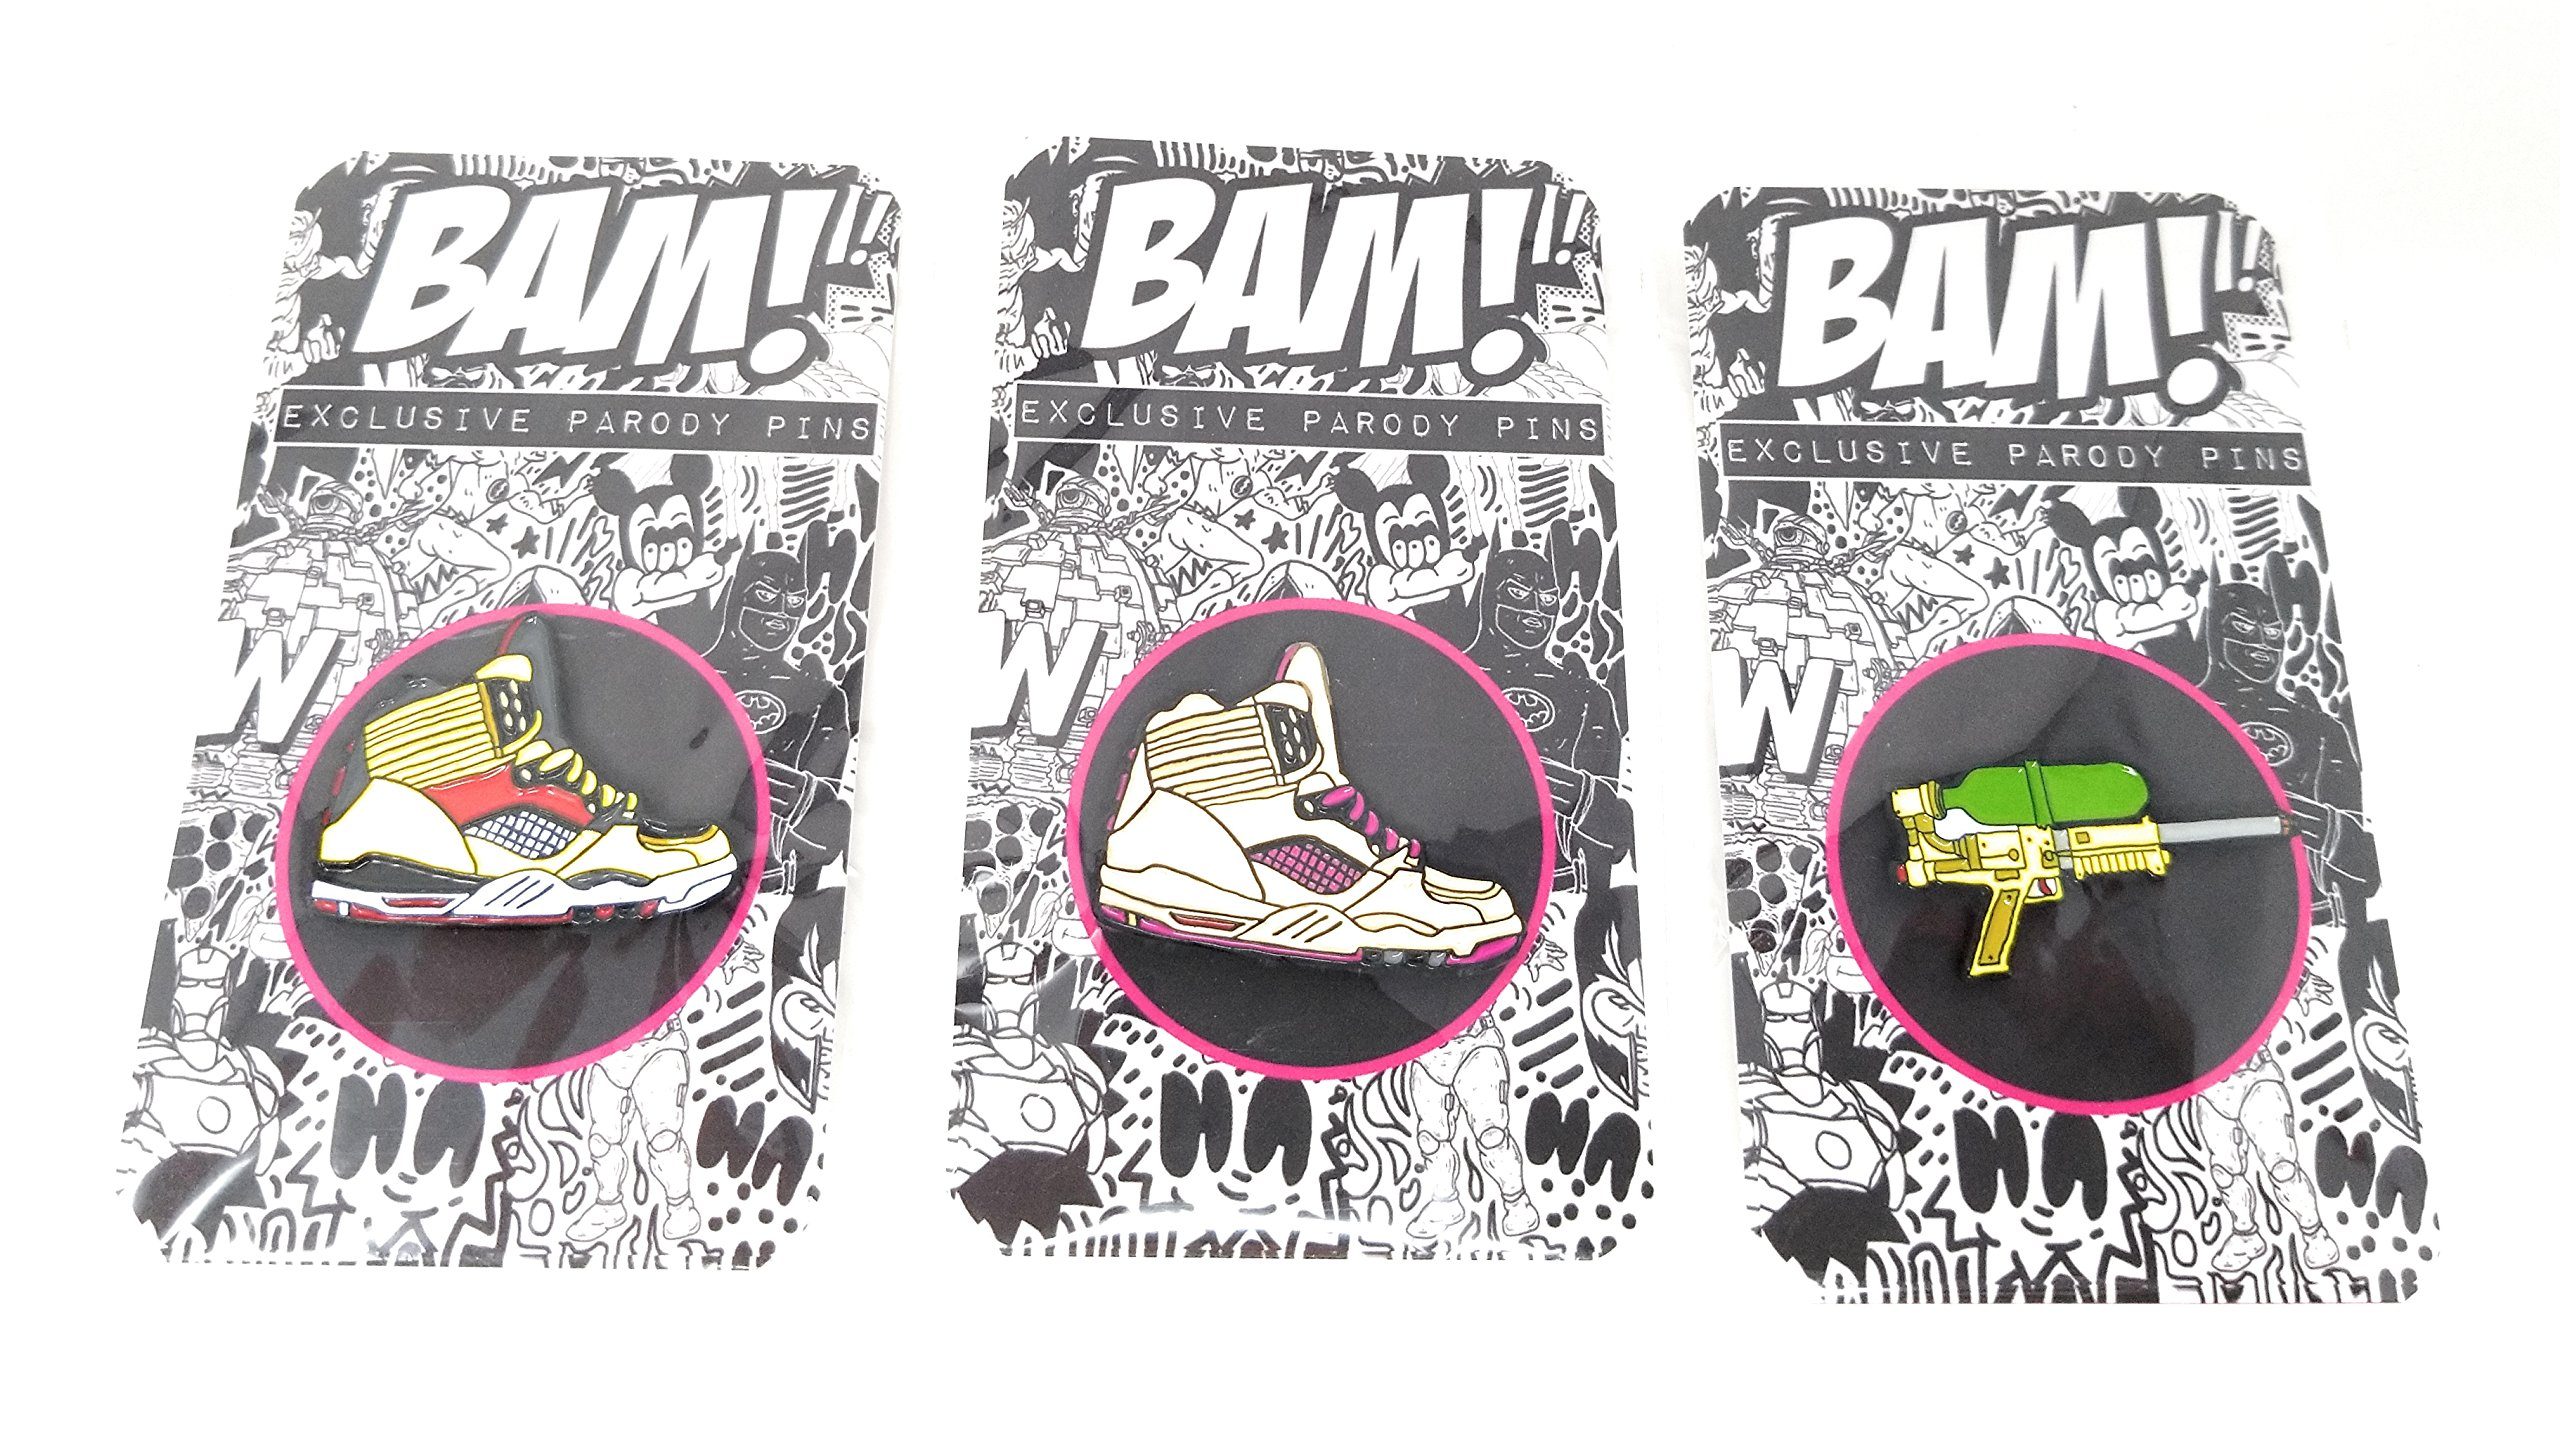 Rare Set of 3 '90's Variant BAM! Box Enamel Pins - 2 Air Jordans Sneaker Variants + Supersoaker